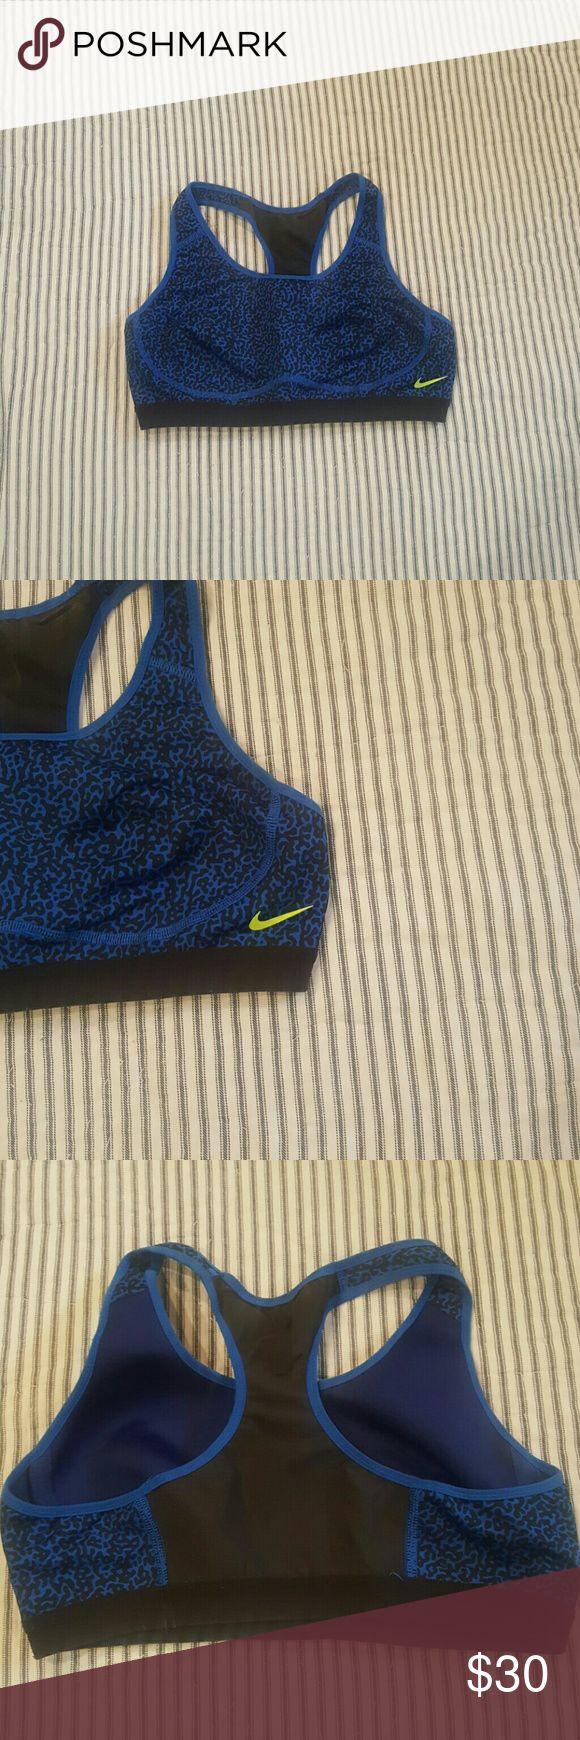 NWOT neoprene leopard Nike Dry Fit bra Blue and leopard NIKE full support DRY FIT Neoprene sports bra. BRAND NEW CONDITION yellow swish Nike Intimates & Sleepwear